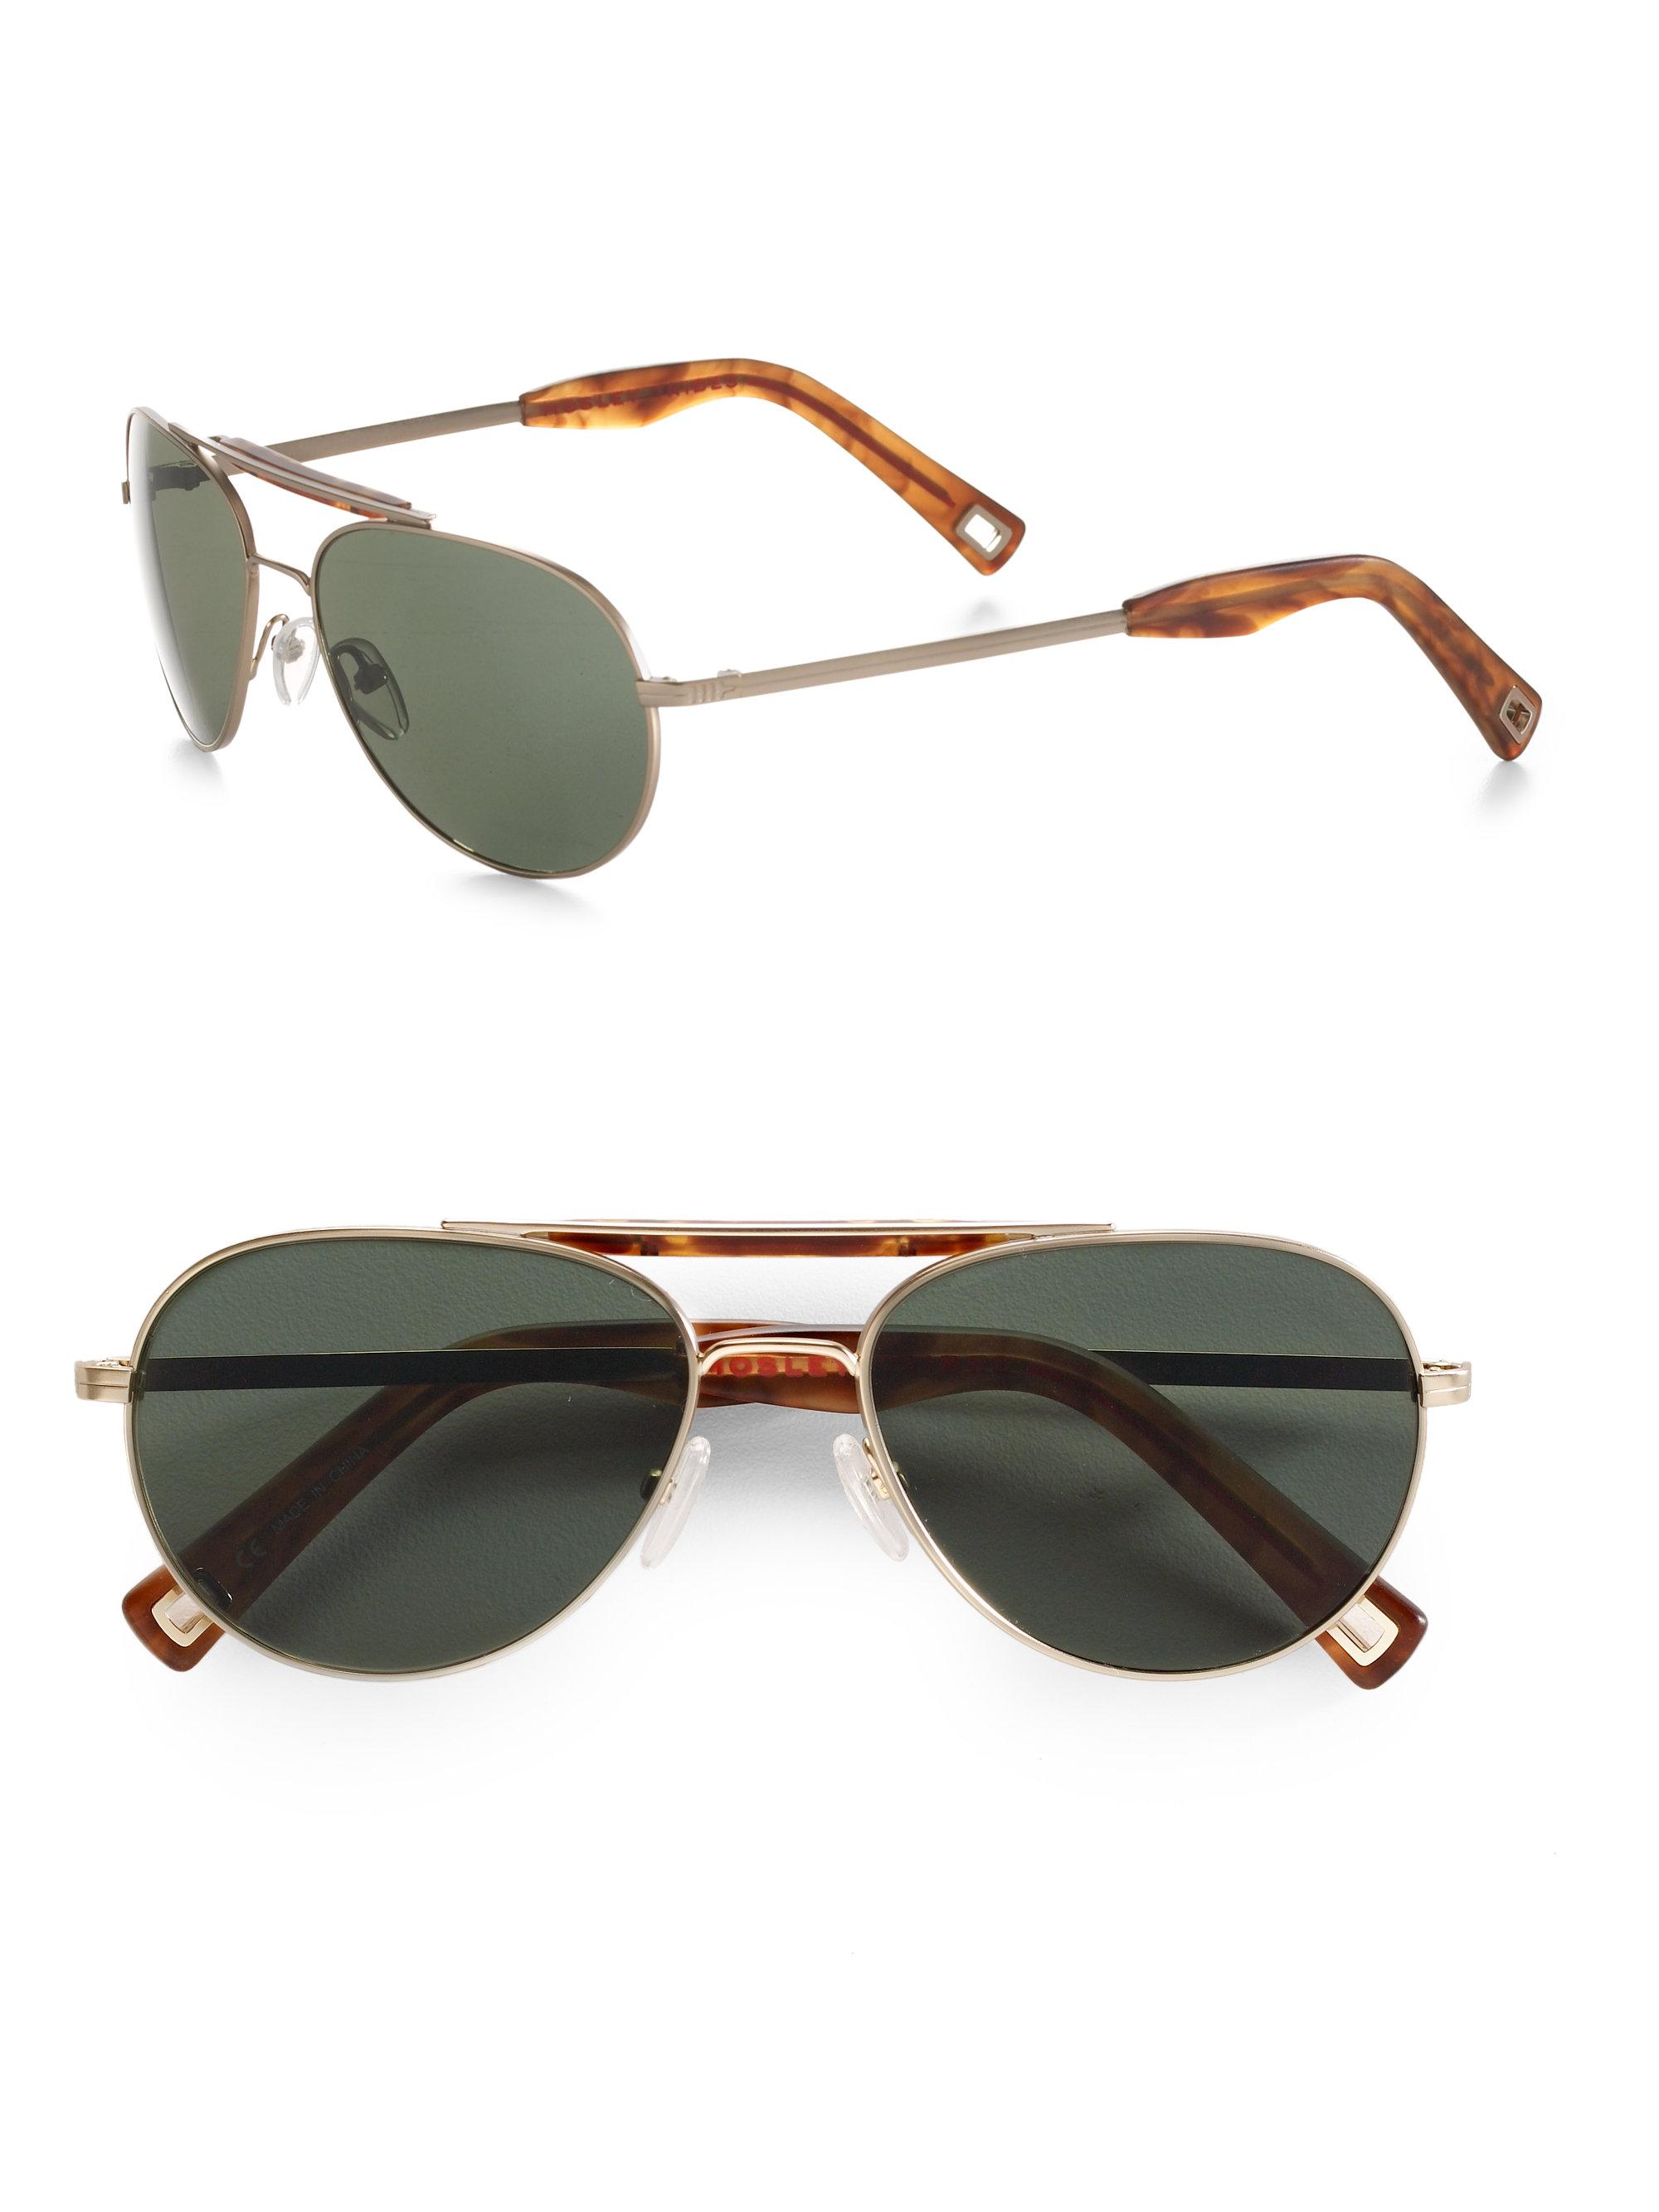 3e3aa0c3099e7 Lyst - Mosley Tribes Crane Aviator Sunglasses in Brown